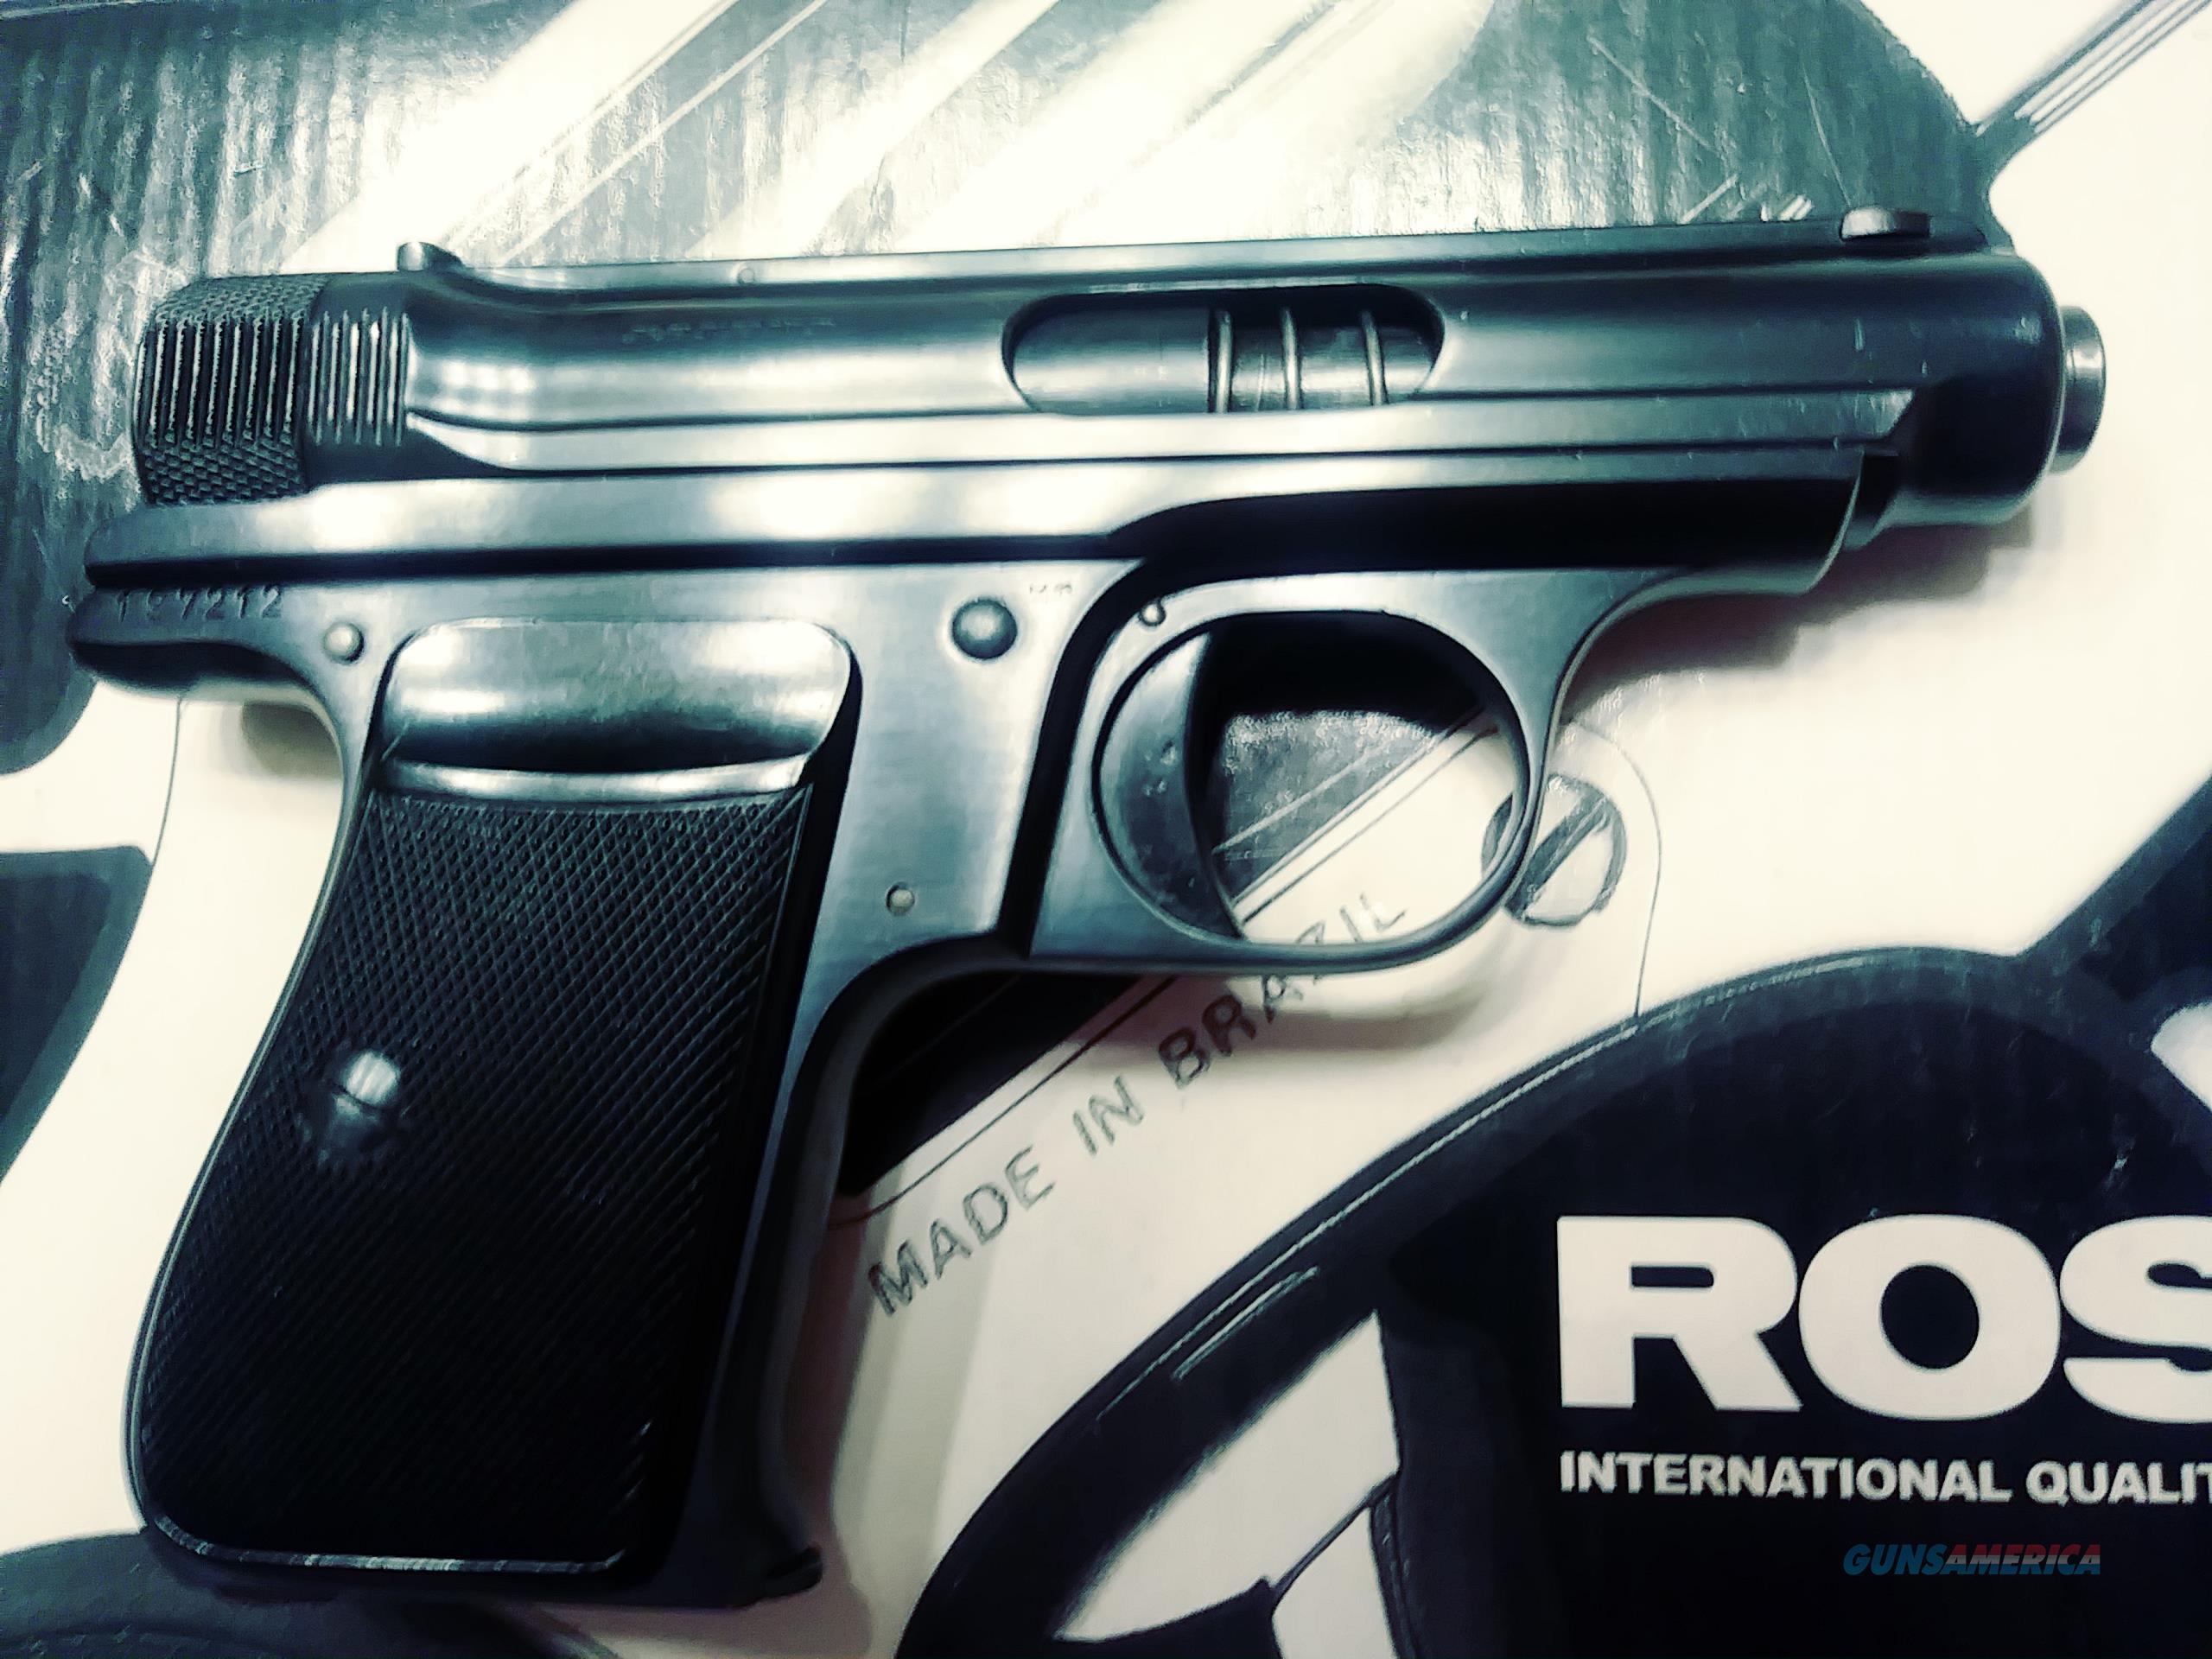 JP Sauer & Sohn 7.65MM Auto Pistol  Guns > Pistols > J.P Sauer Pistols